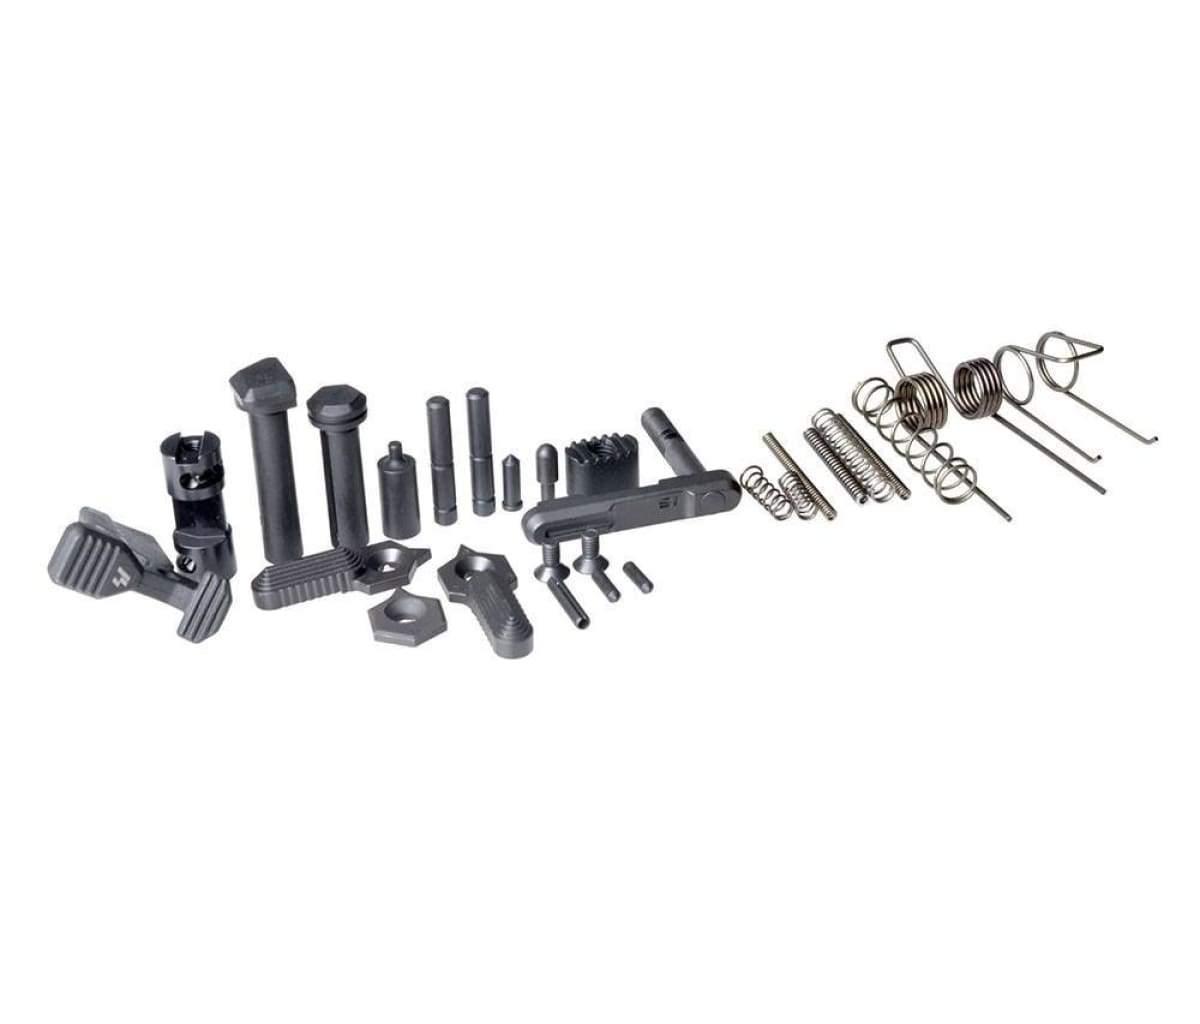 Strike Industries Ar 15 Enhanced Lower Receiver Parts Kit